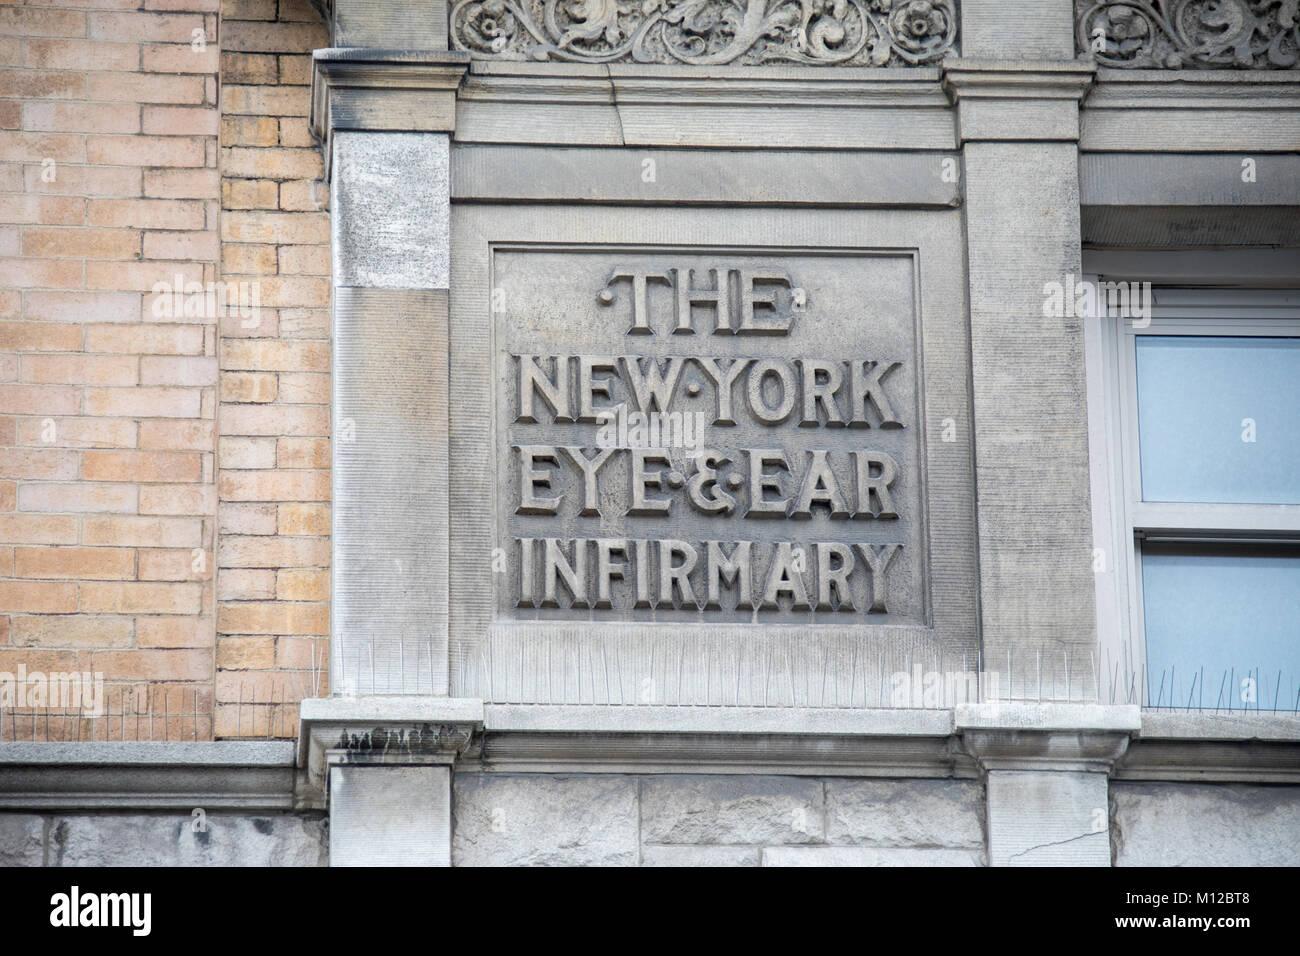 New York Eye and Ear Infirmary of Mount Sinai, East Village, New York City - Stock Image